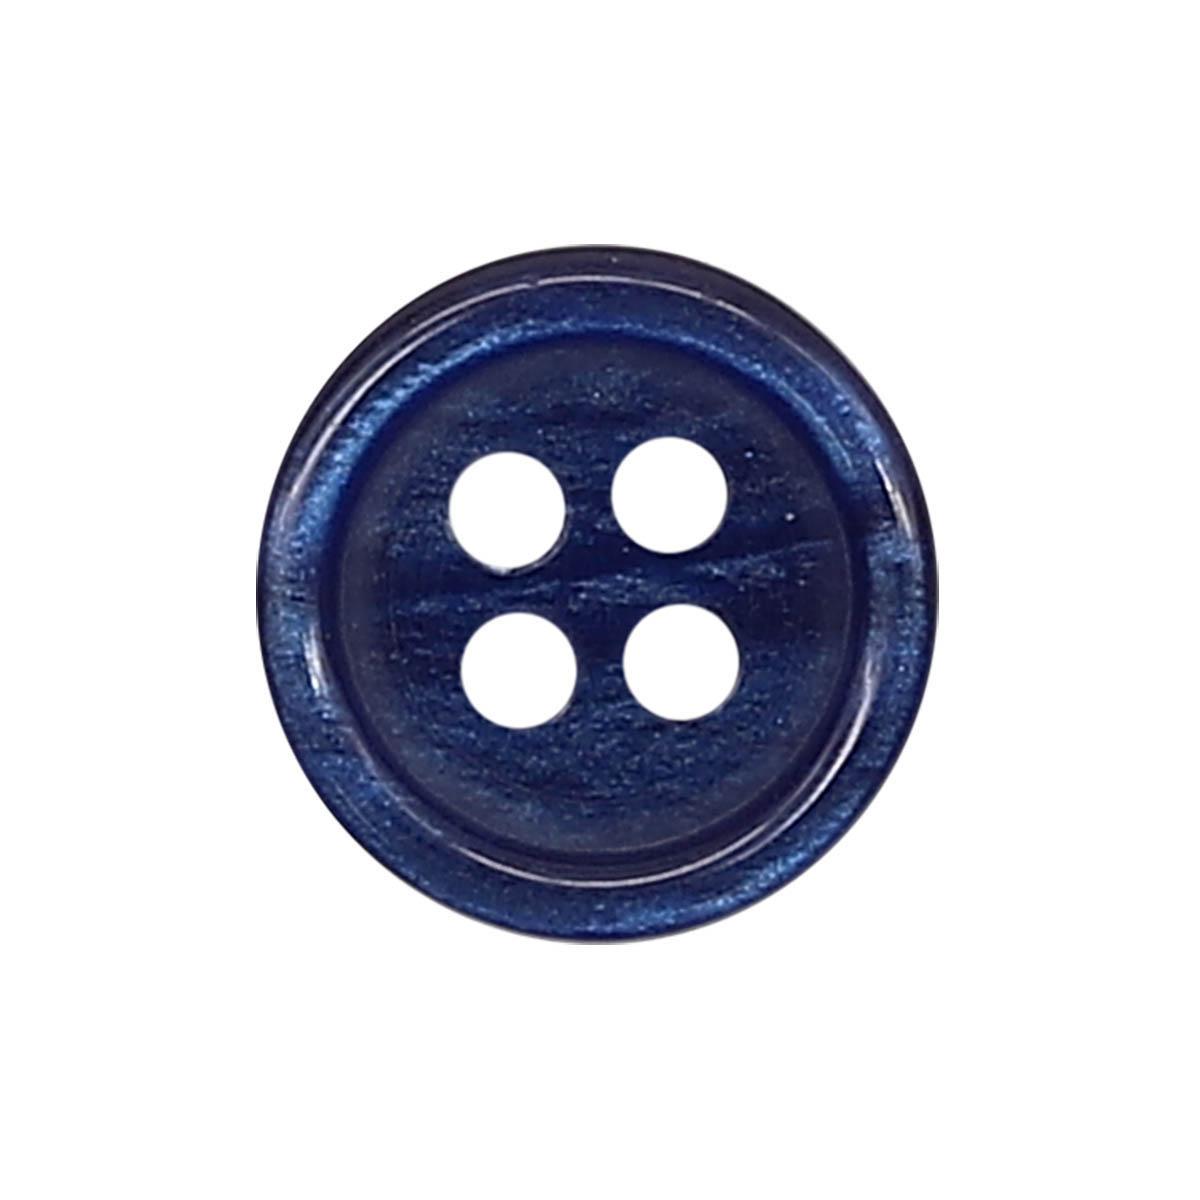 35483/4 18 (3507) Пуговица 4прокола син.глянц.полиэстер ГР